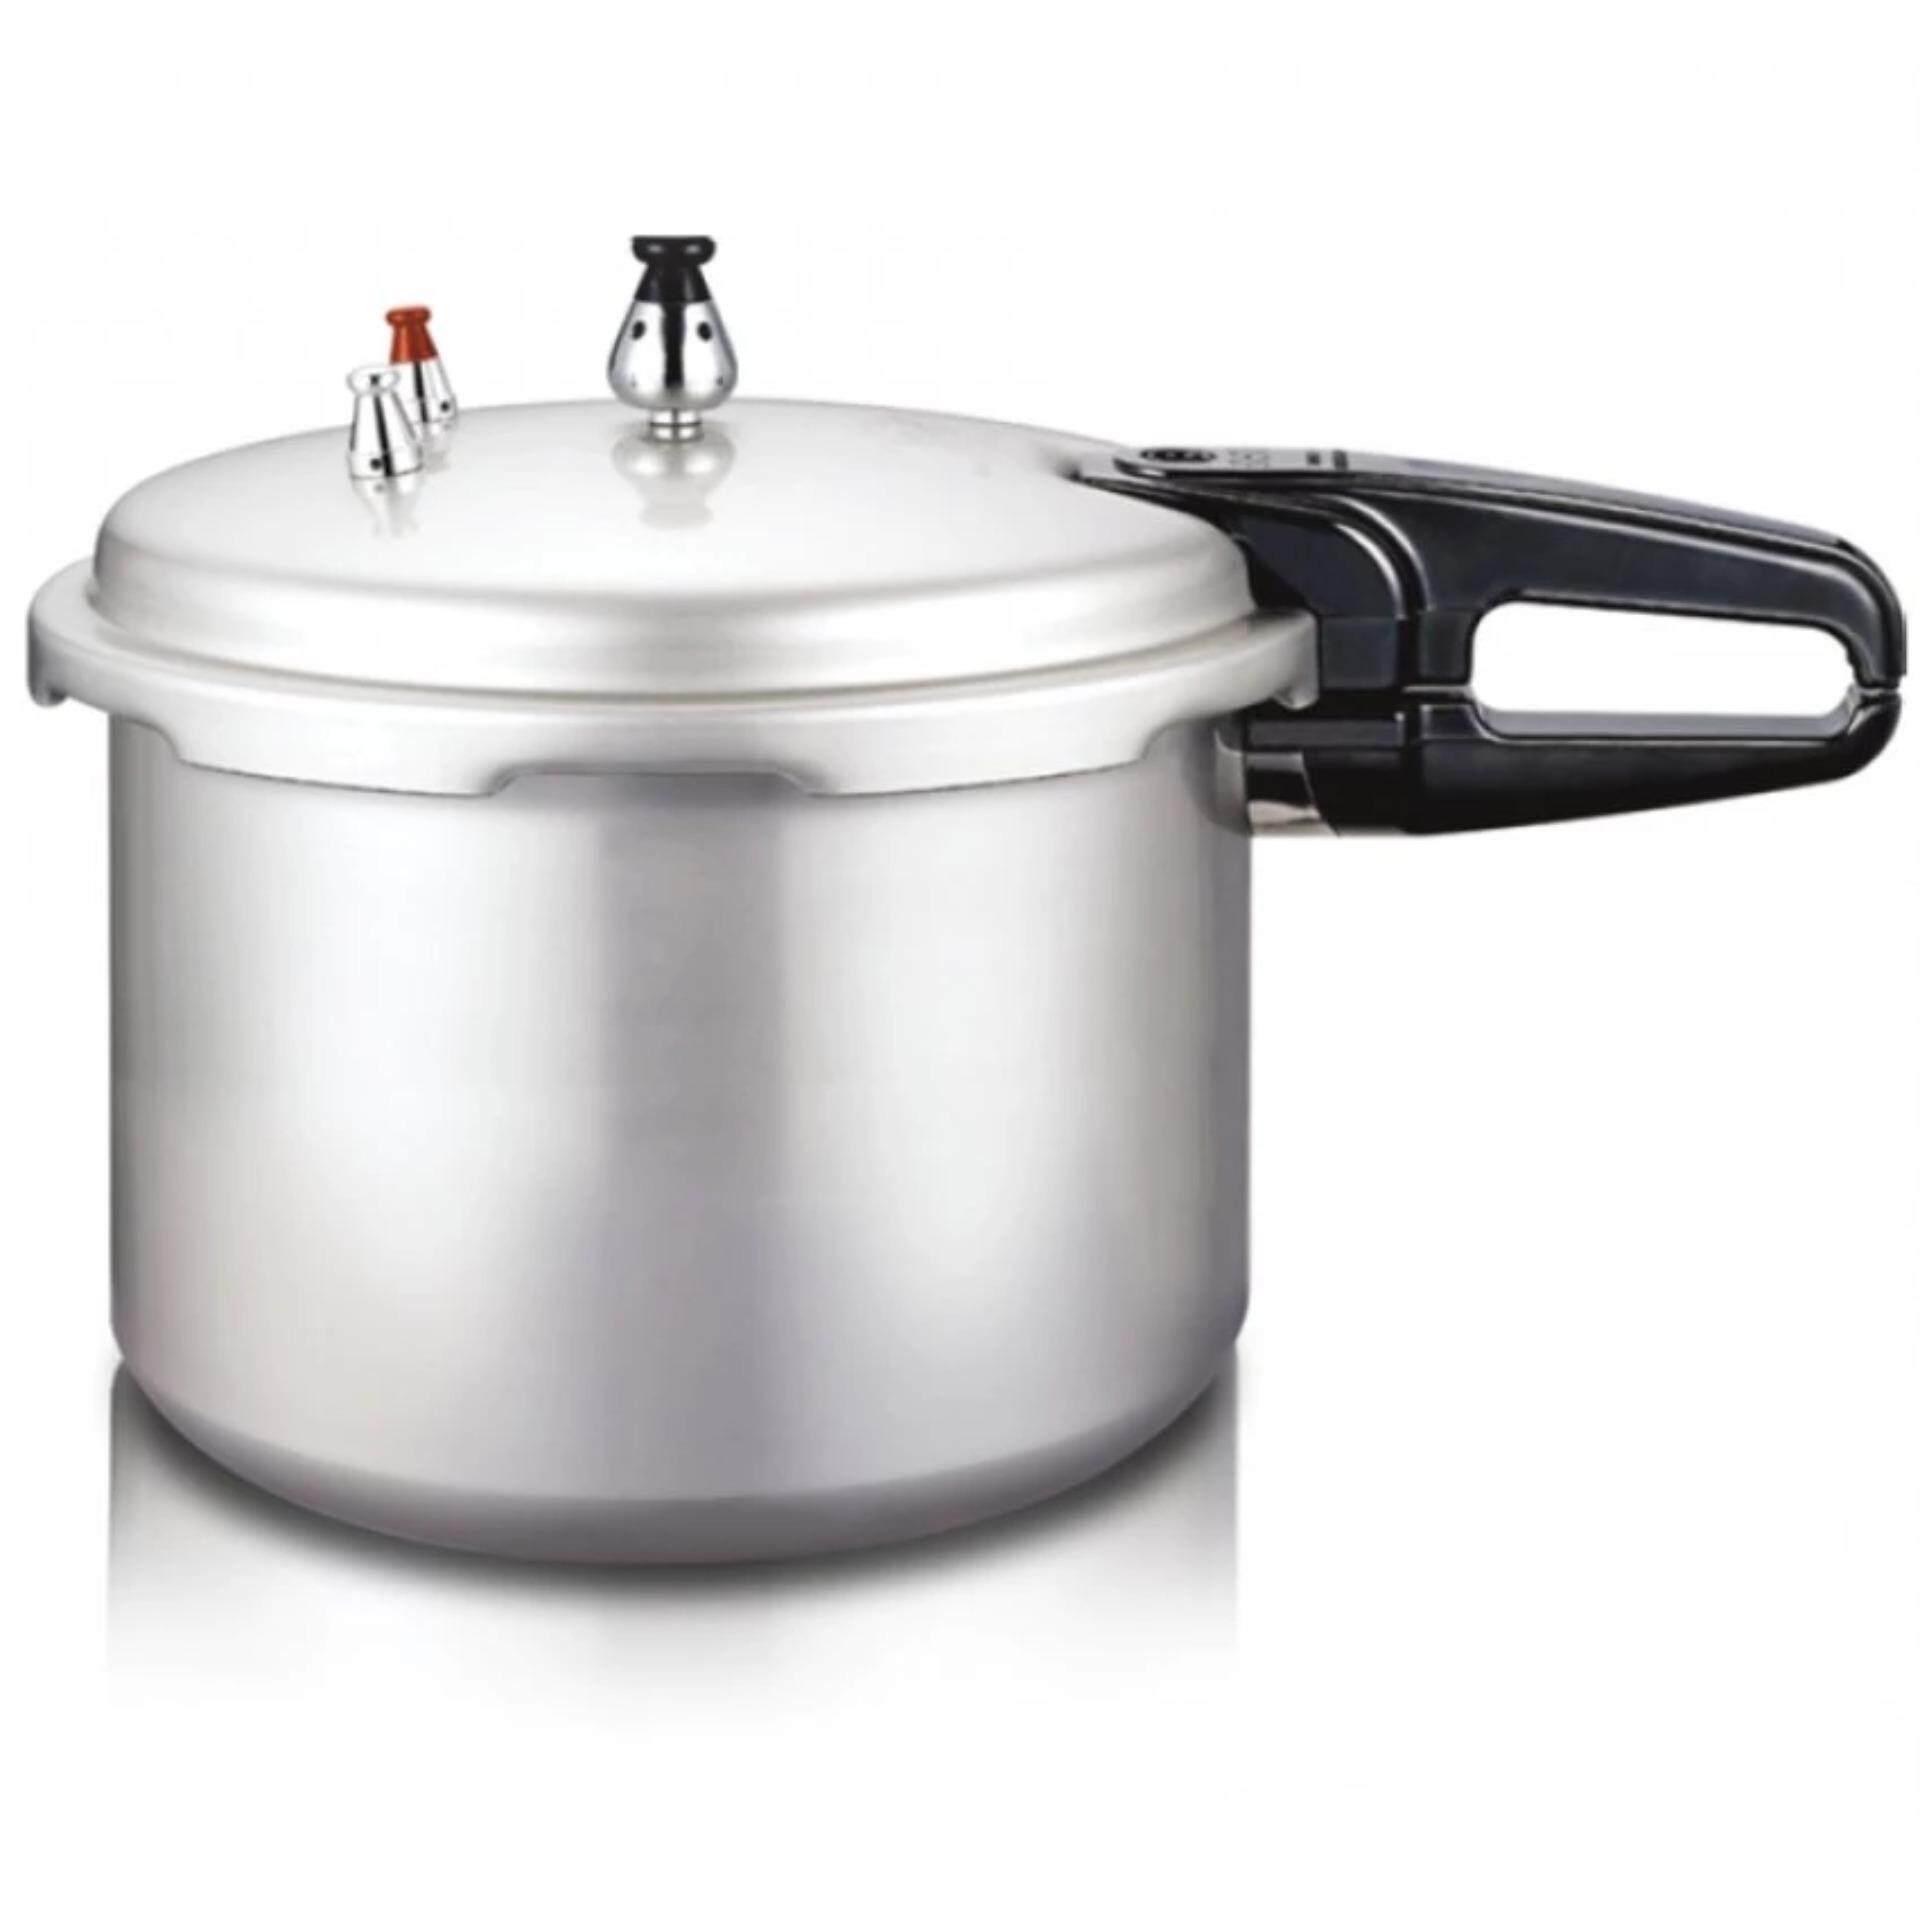 Trio Pressure Cooker 9.0L TPC-2690